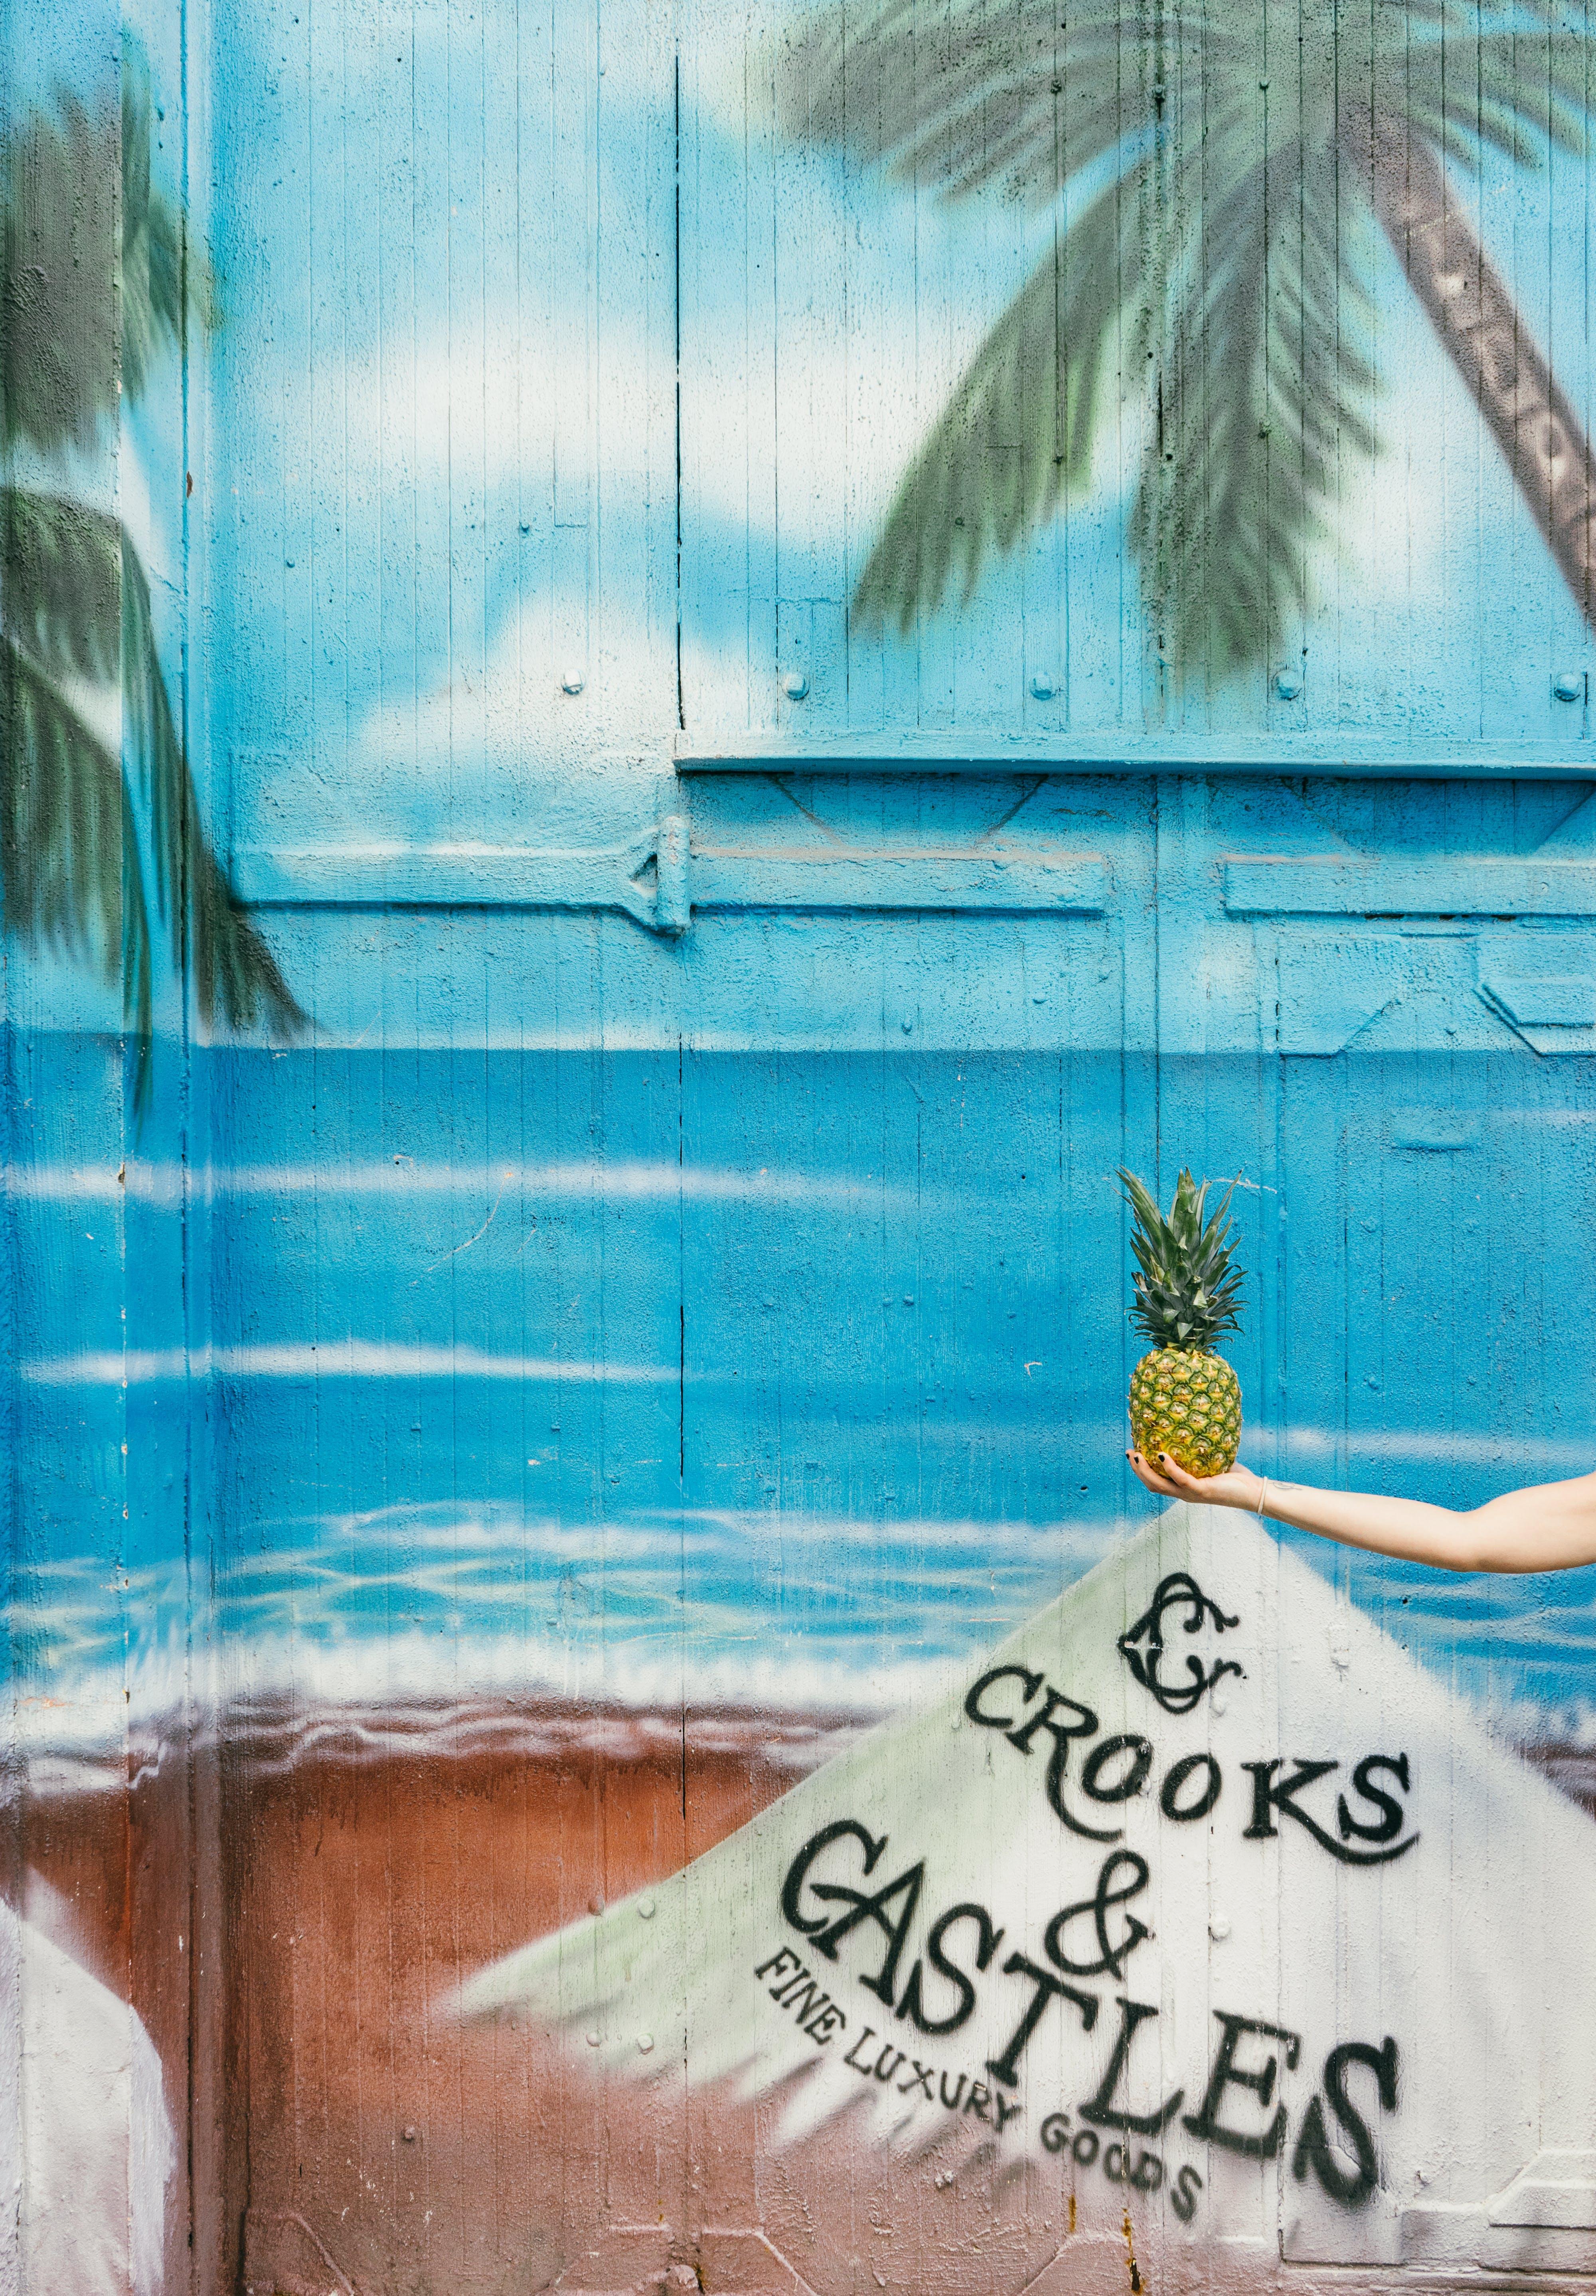 zu ananas, arm, frucht, graffiti